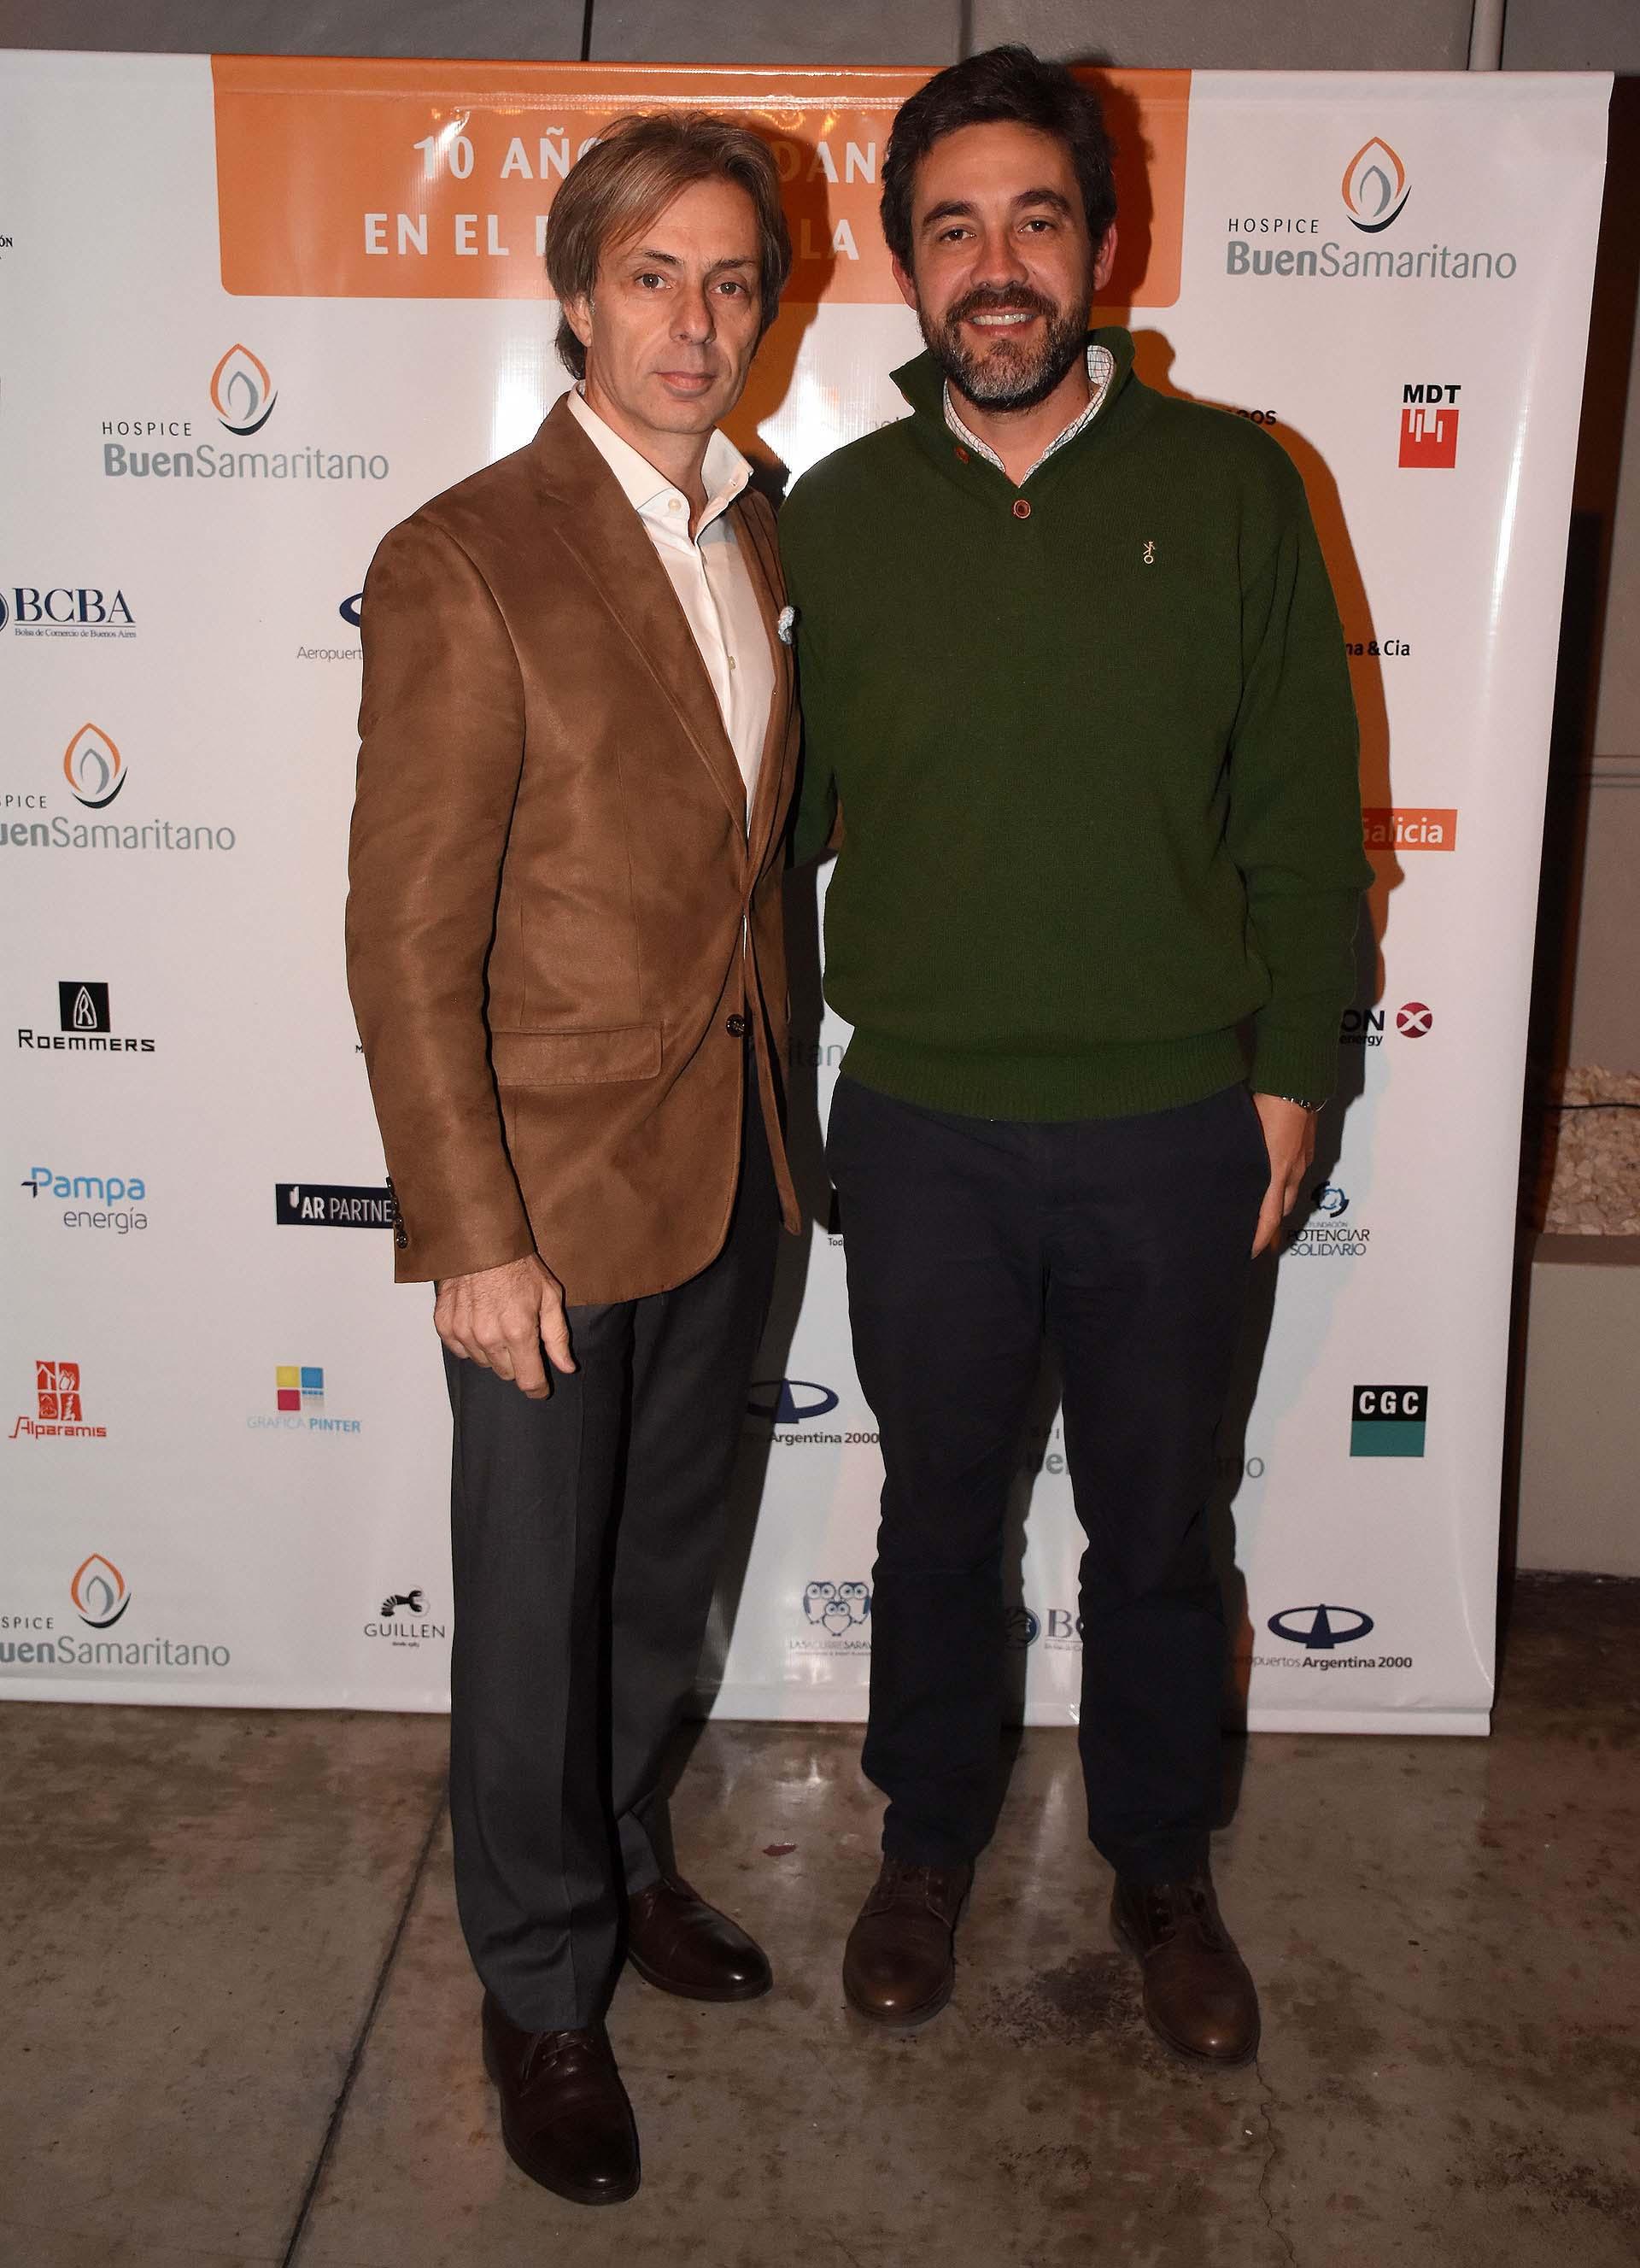 Juan Manuel Llapur y Alberto Willi, director ejecutivo del MBA de IAE